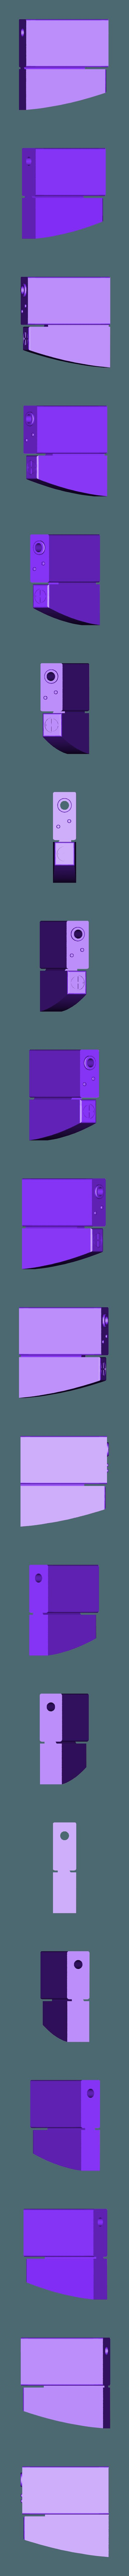 rifle_part_6.stl Download free STL file Photon Rifle (The Flash) • 3D print template, poblocki1982